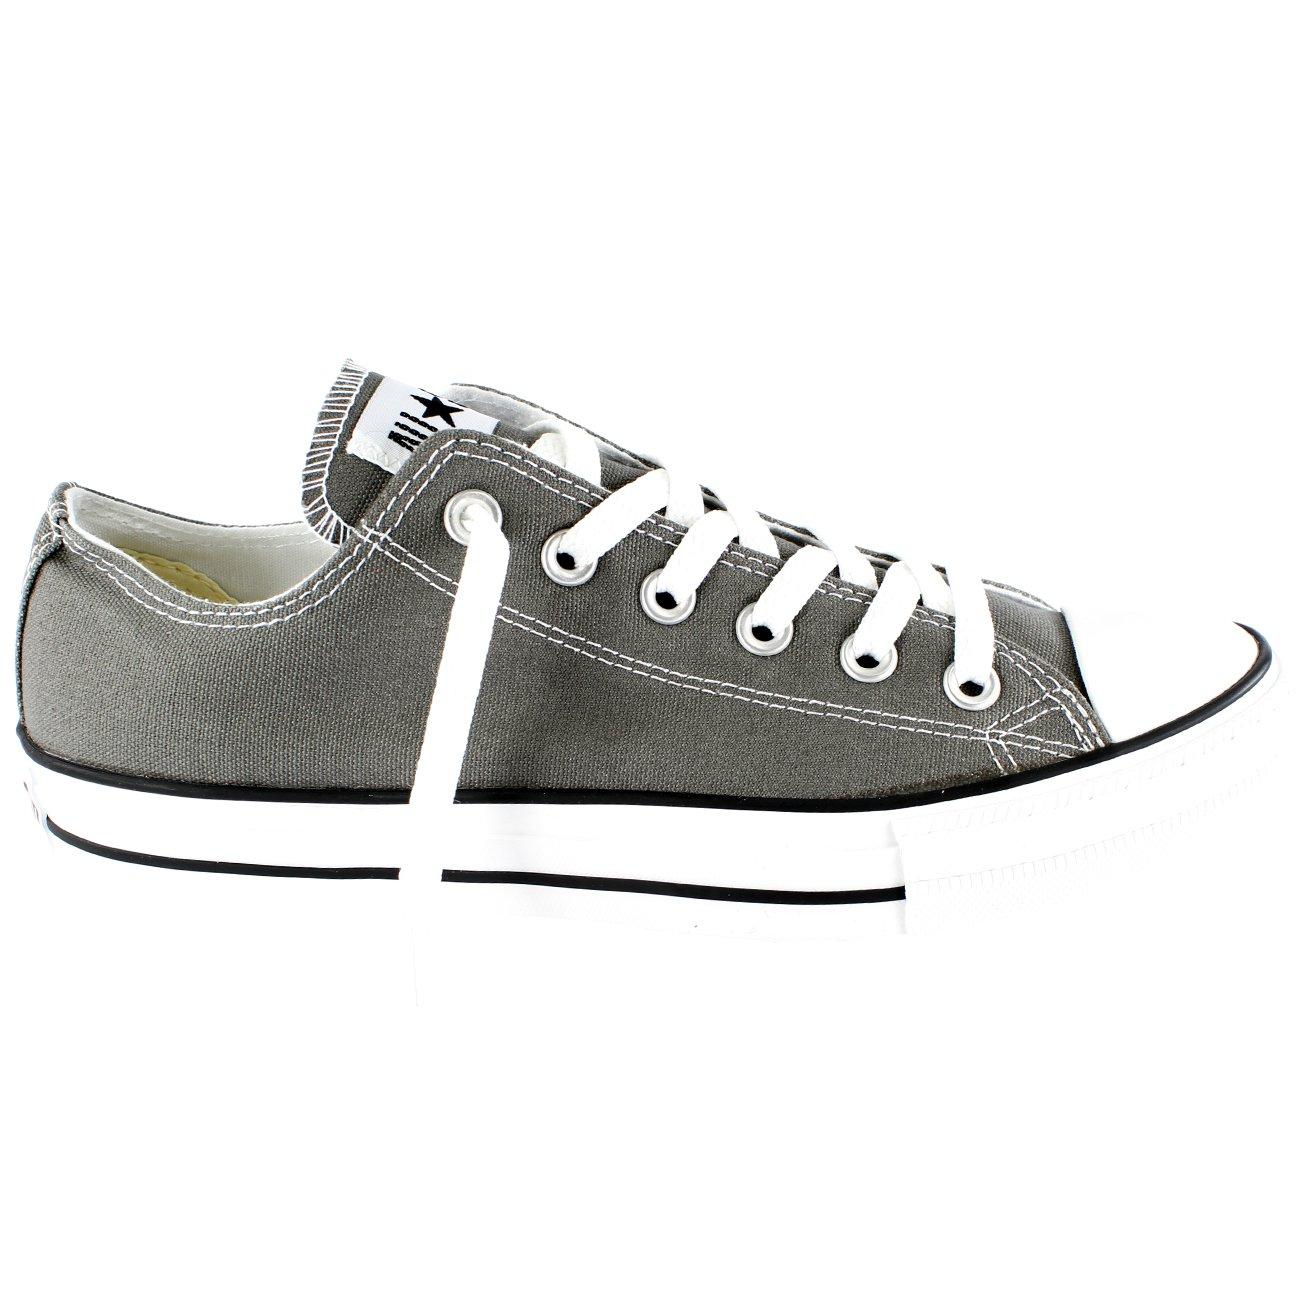 afe4bd35d187 Converse Unisex Chuck Taylor All Star Low Top Sneakers - Charcoal - 11.5 B(M)  US Women   9.5 D(M) US Men